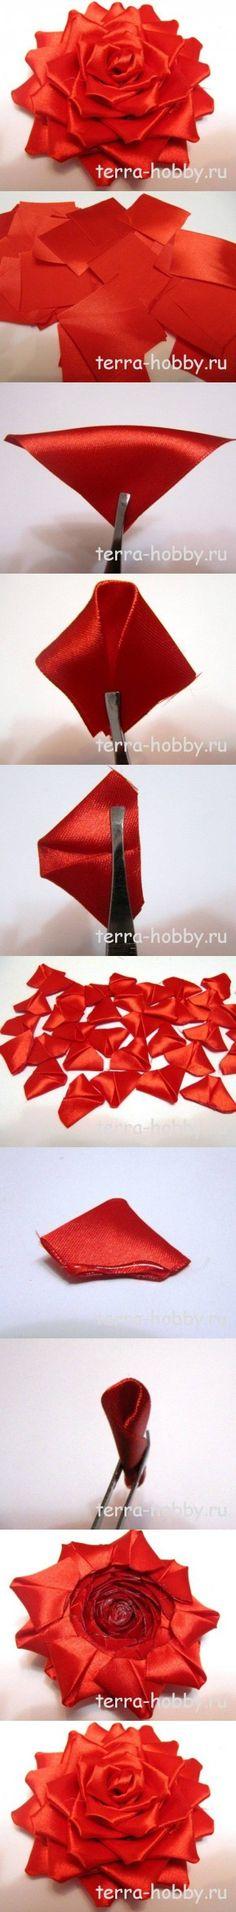 DIY Elegant Ribbon Rose for Wedding DIY Projects